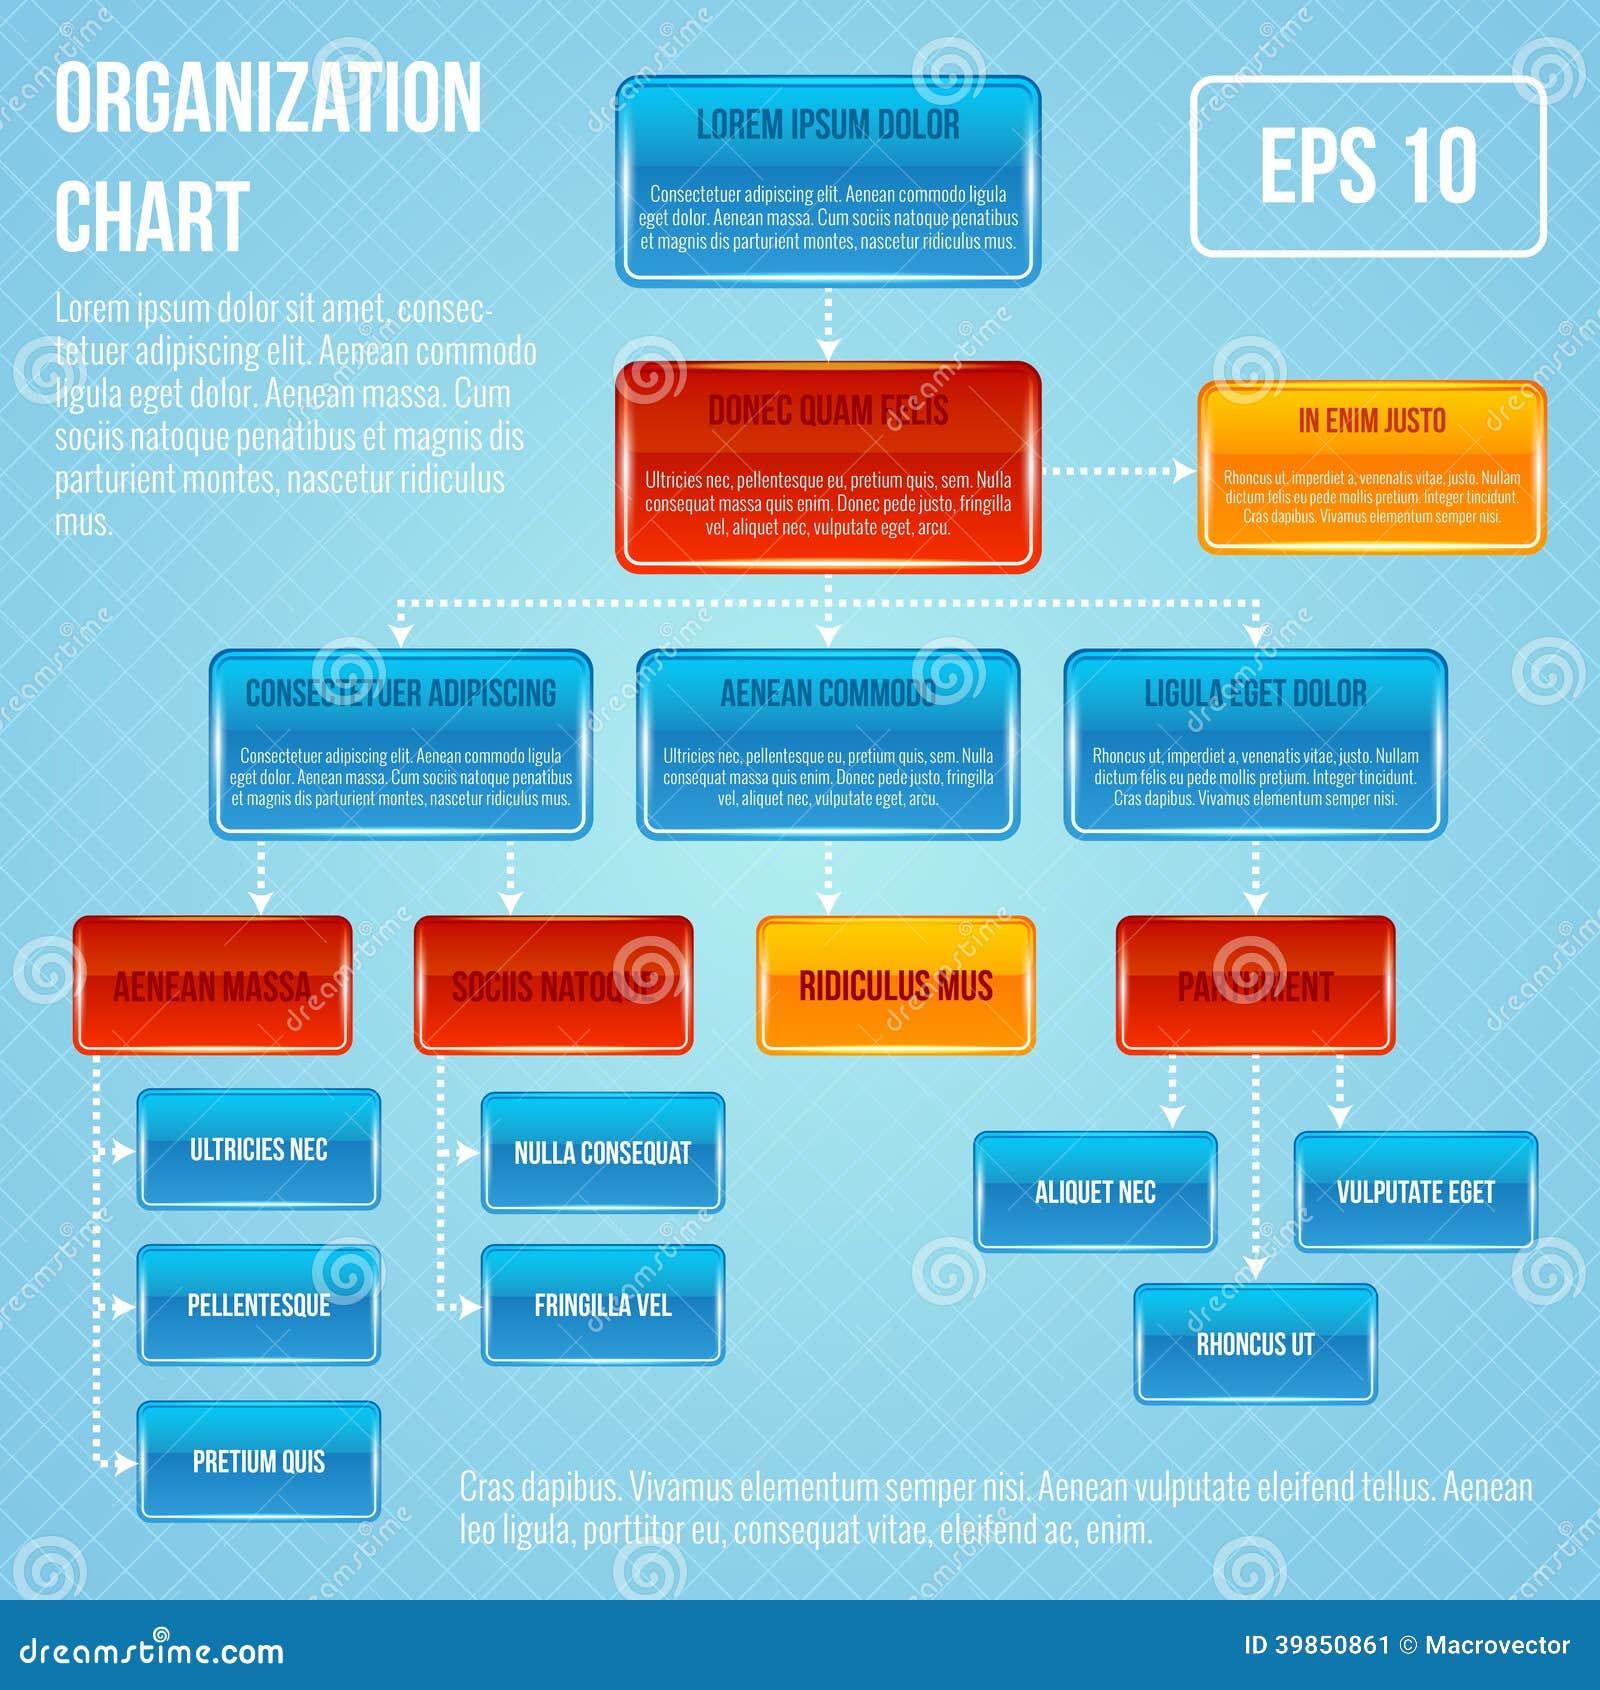 Infographic的组织系统图